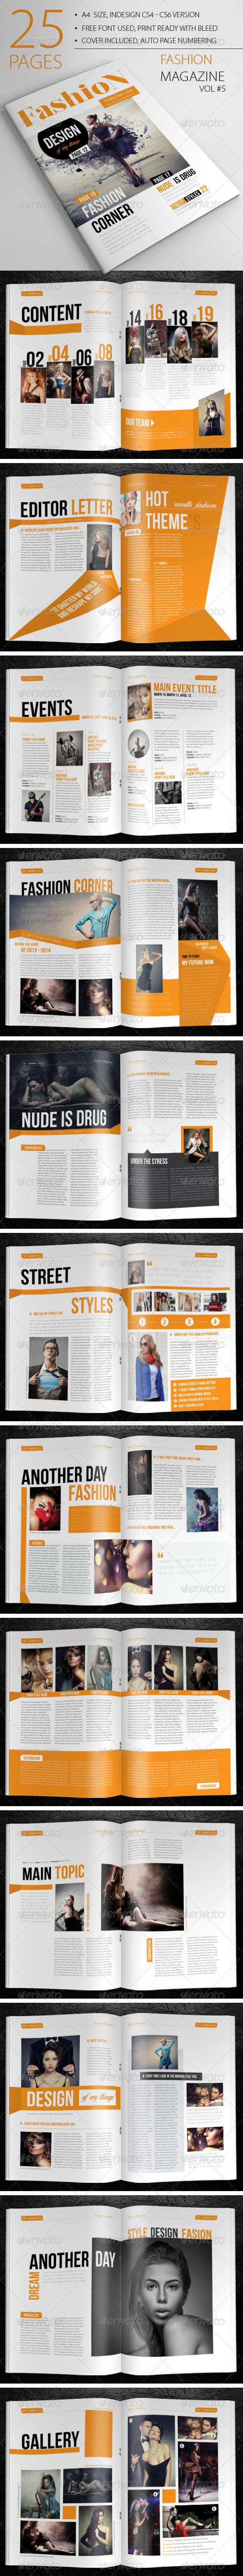 25 Pages Fashion Magazine Vol5 - Magazines Print Templates